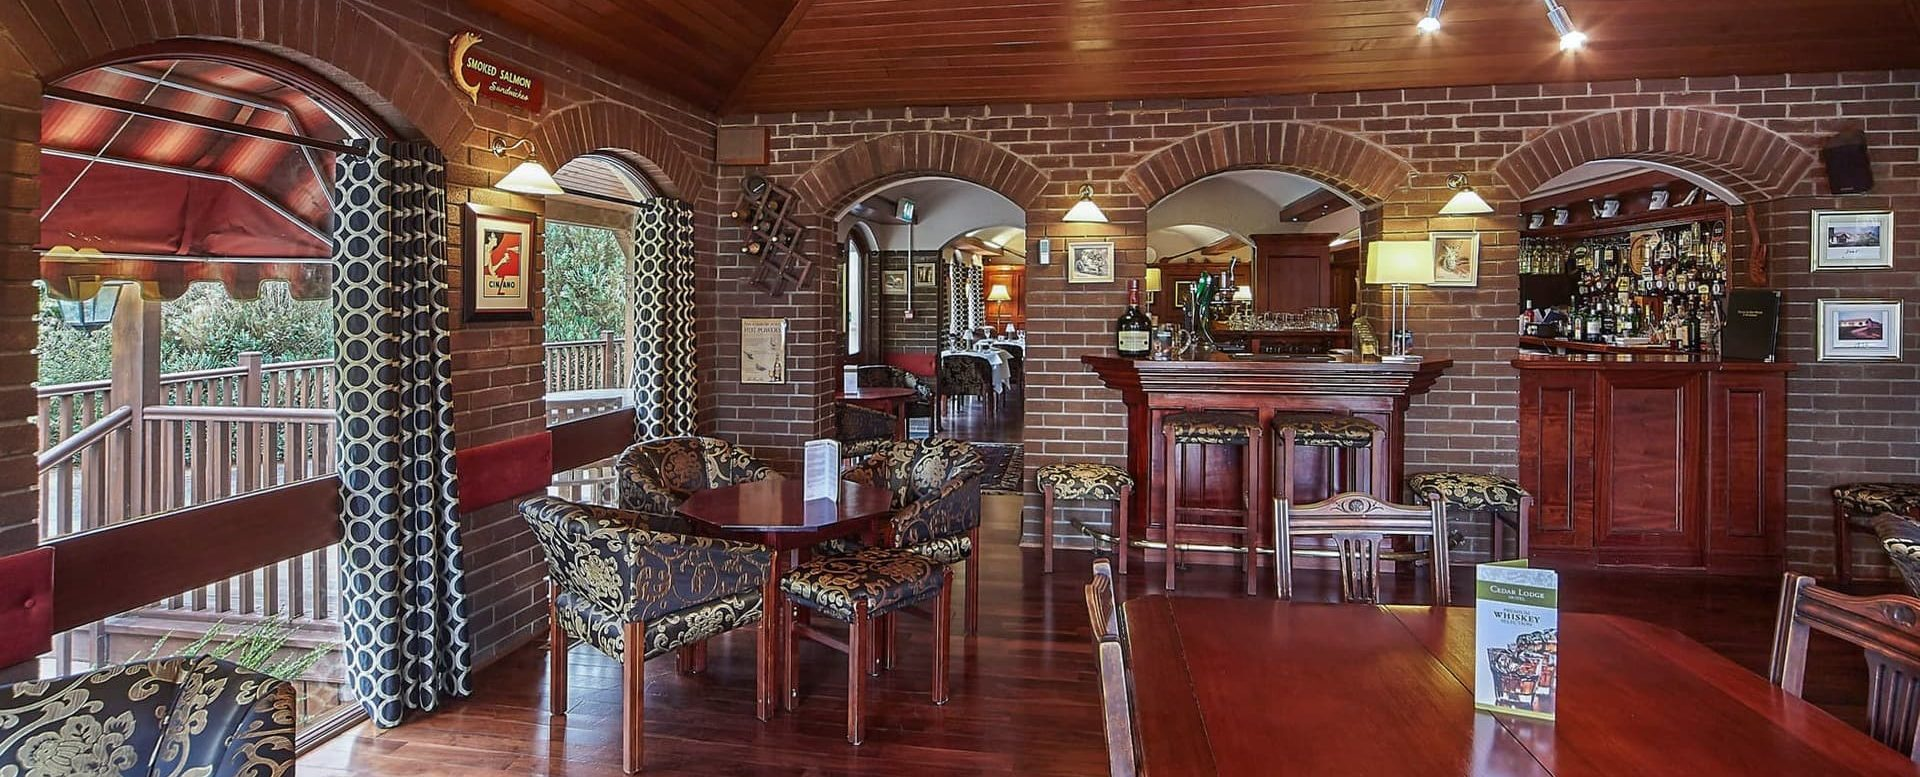 Cedar-Lodge-Bar.resized-1-e1548688832767.jpg